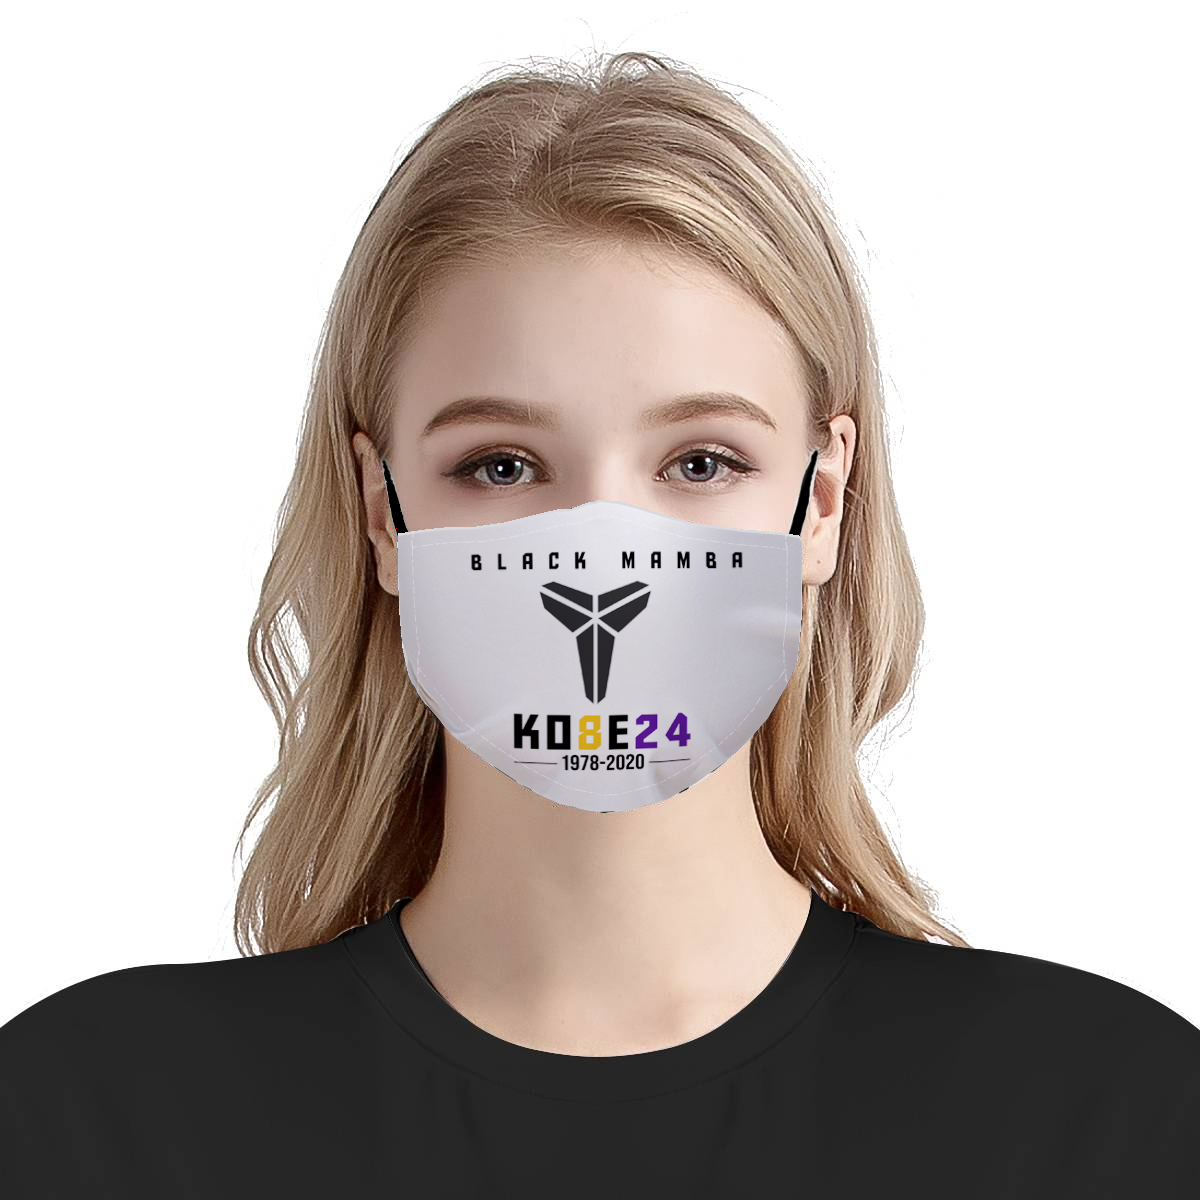 Kobe 24 black mamba 1978-2020 all over printed face mask 4